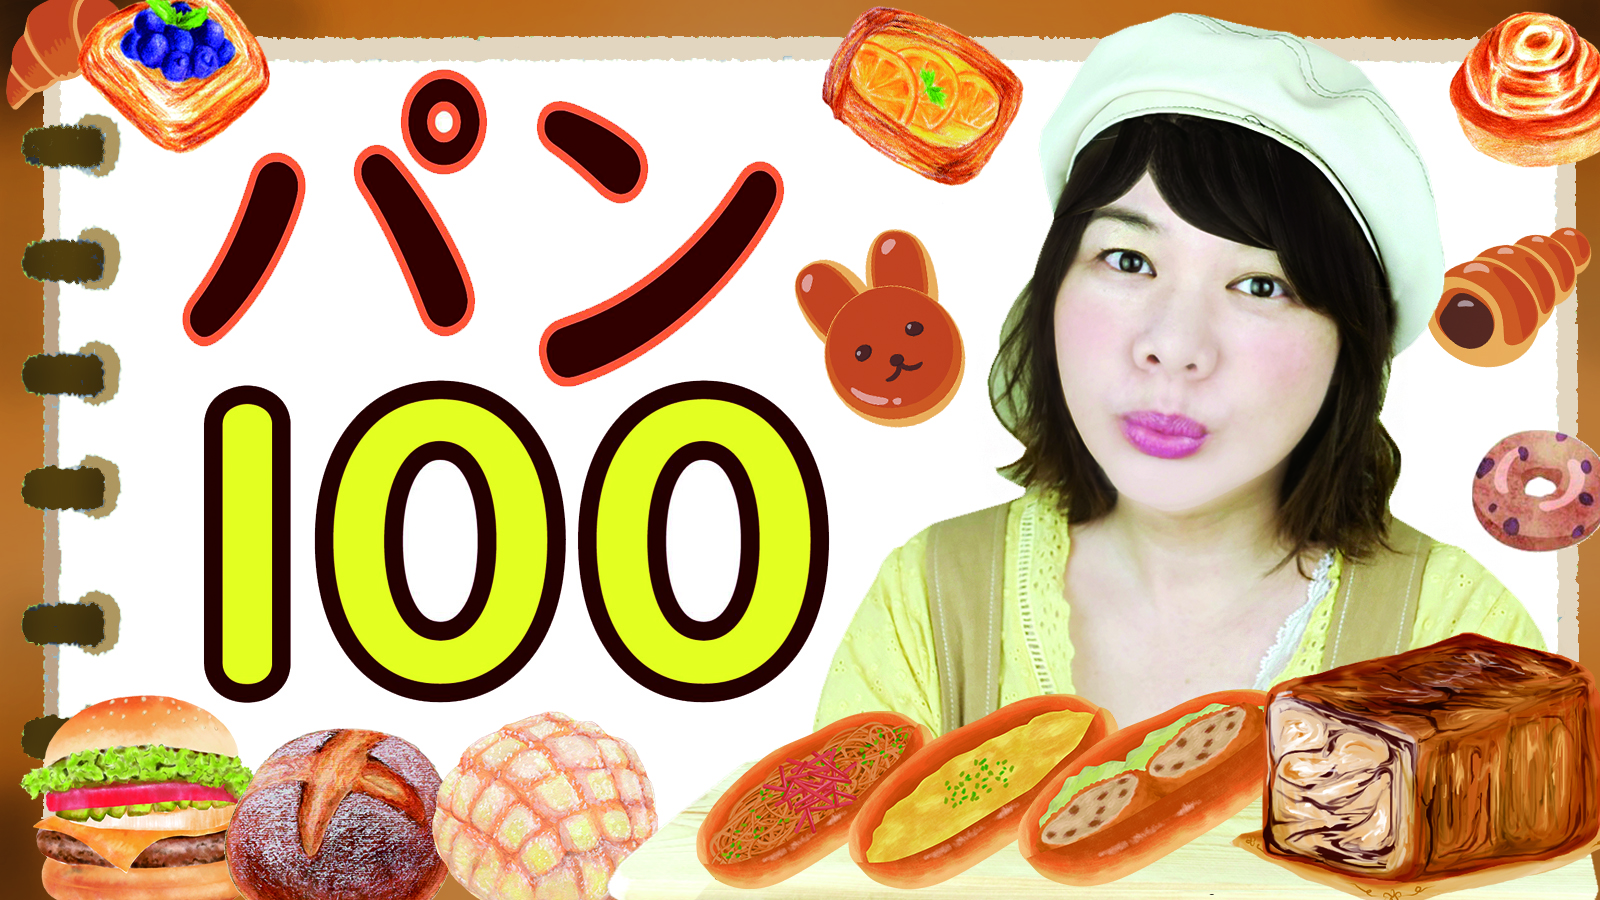 用日文說麵包的種類|100種麵包的日文單字|パン100種類 |単語シリーズ②パン編